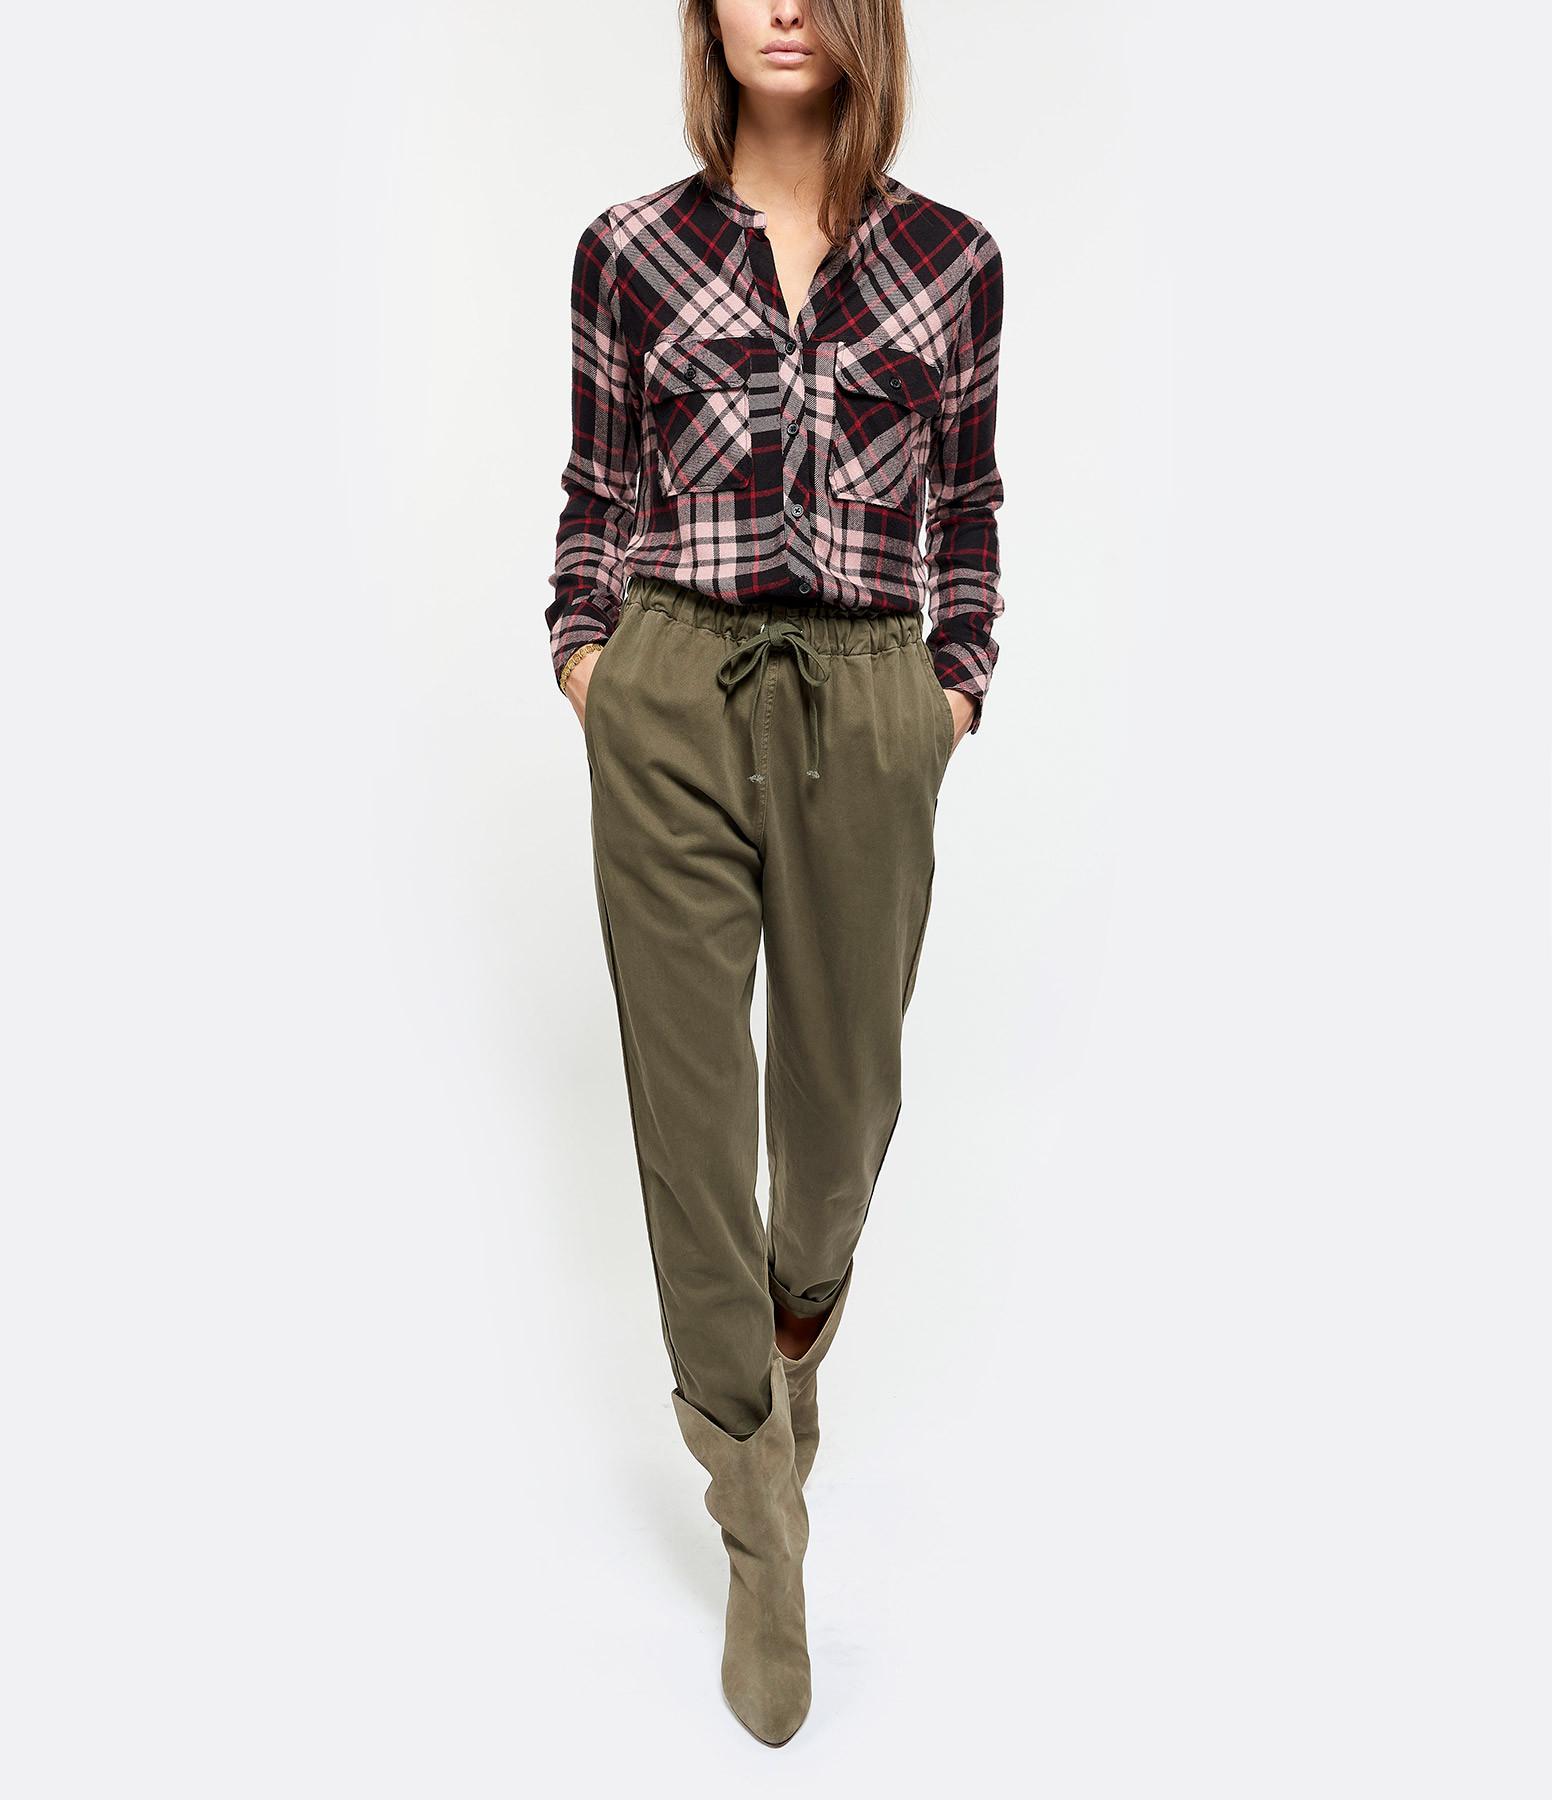 XIRENA - Pantalon Rex Twill Kaki